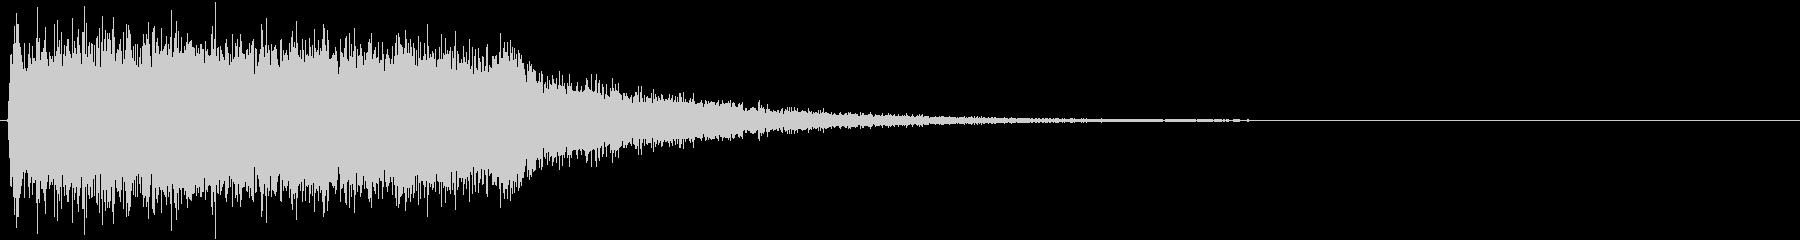 CINEMATIC BRAAMS_10の未再生の波形